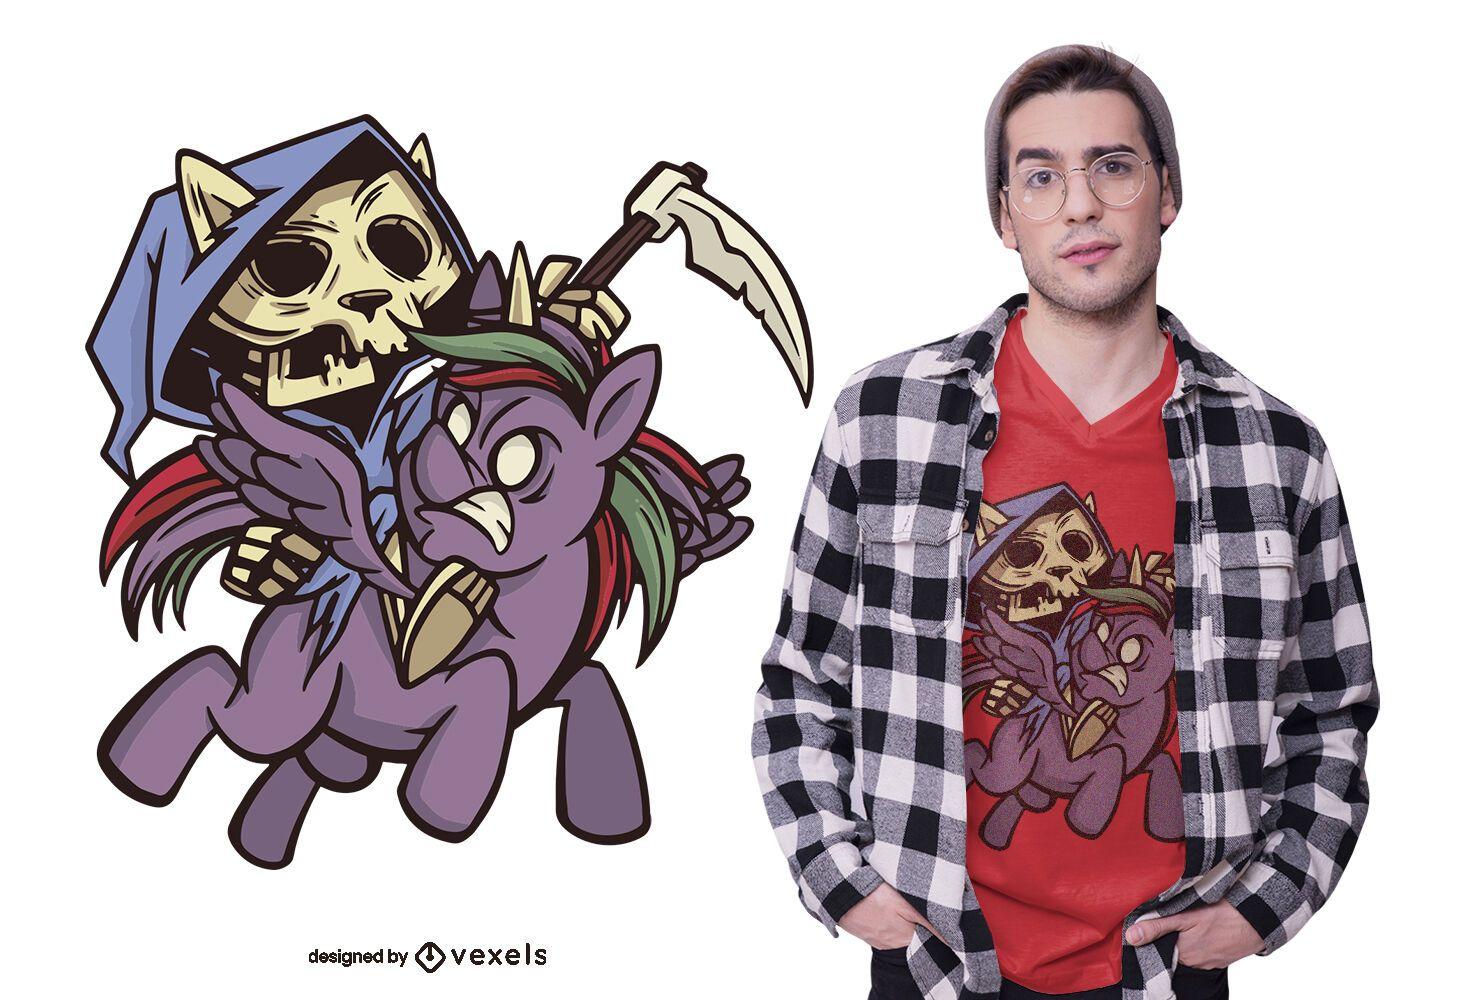 Death apocalypse horsecat t-shirt design